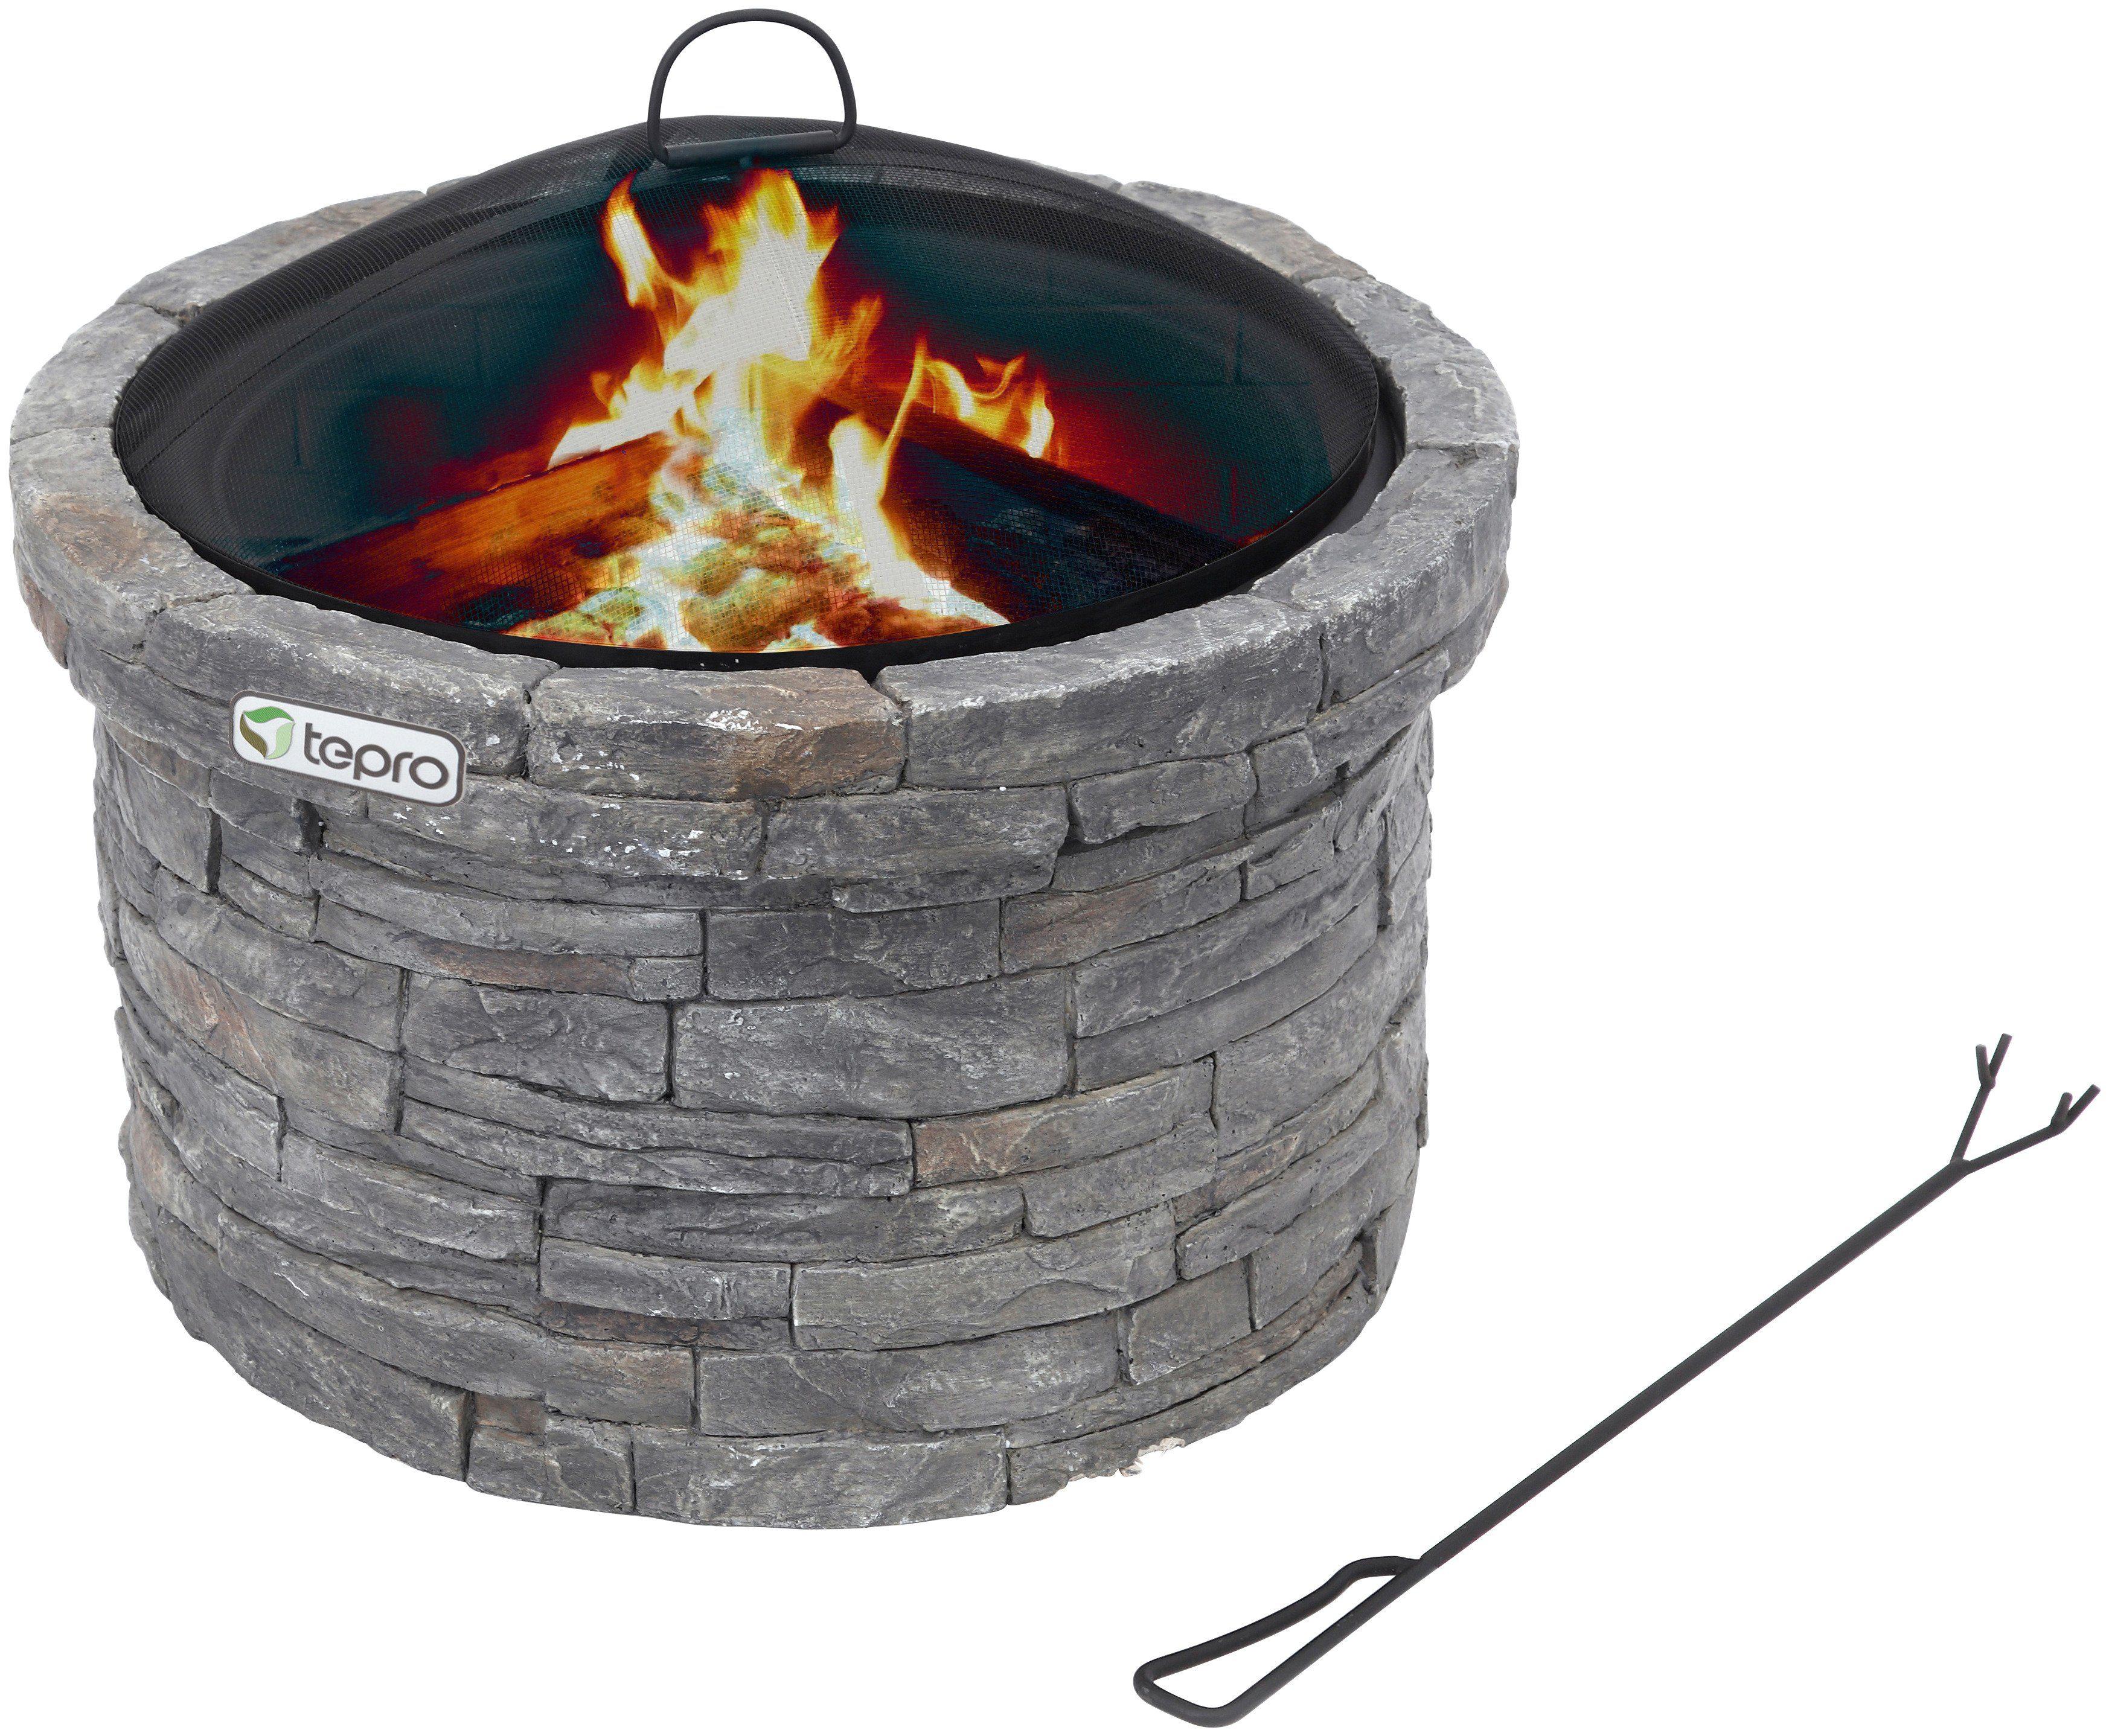 Tepro Feuerstelle »Gladstone«